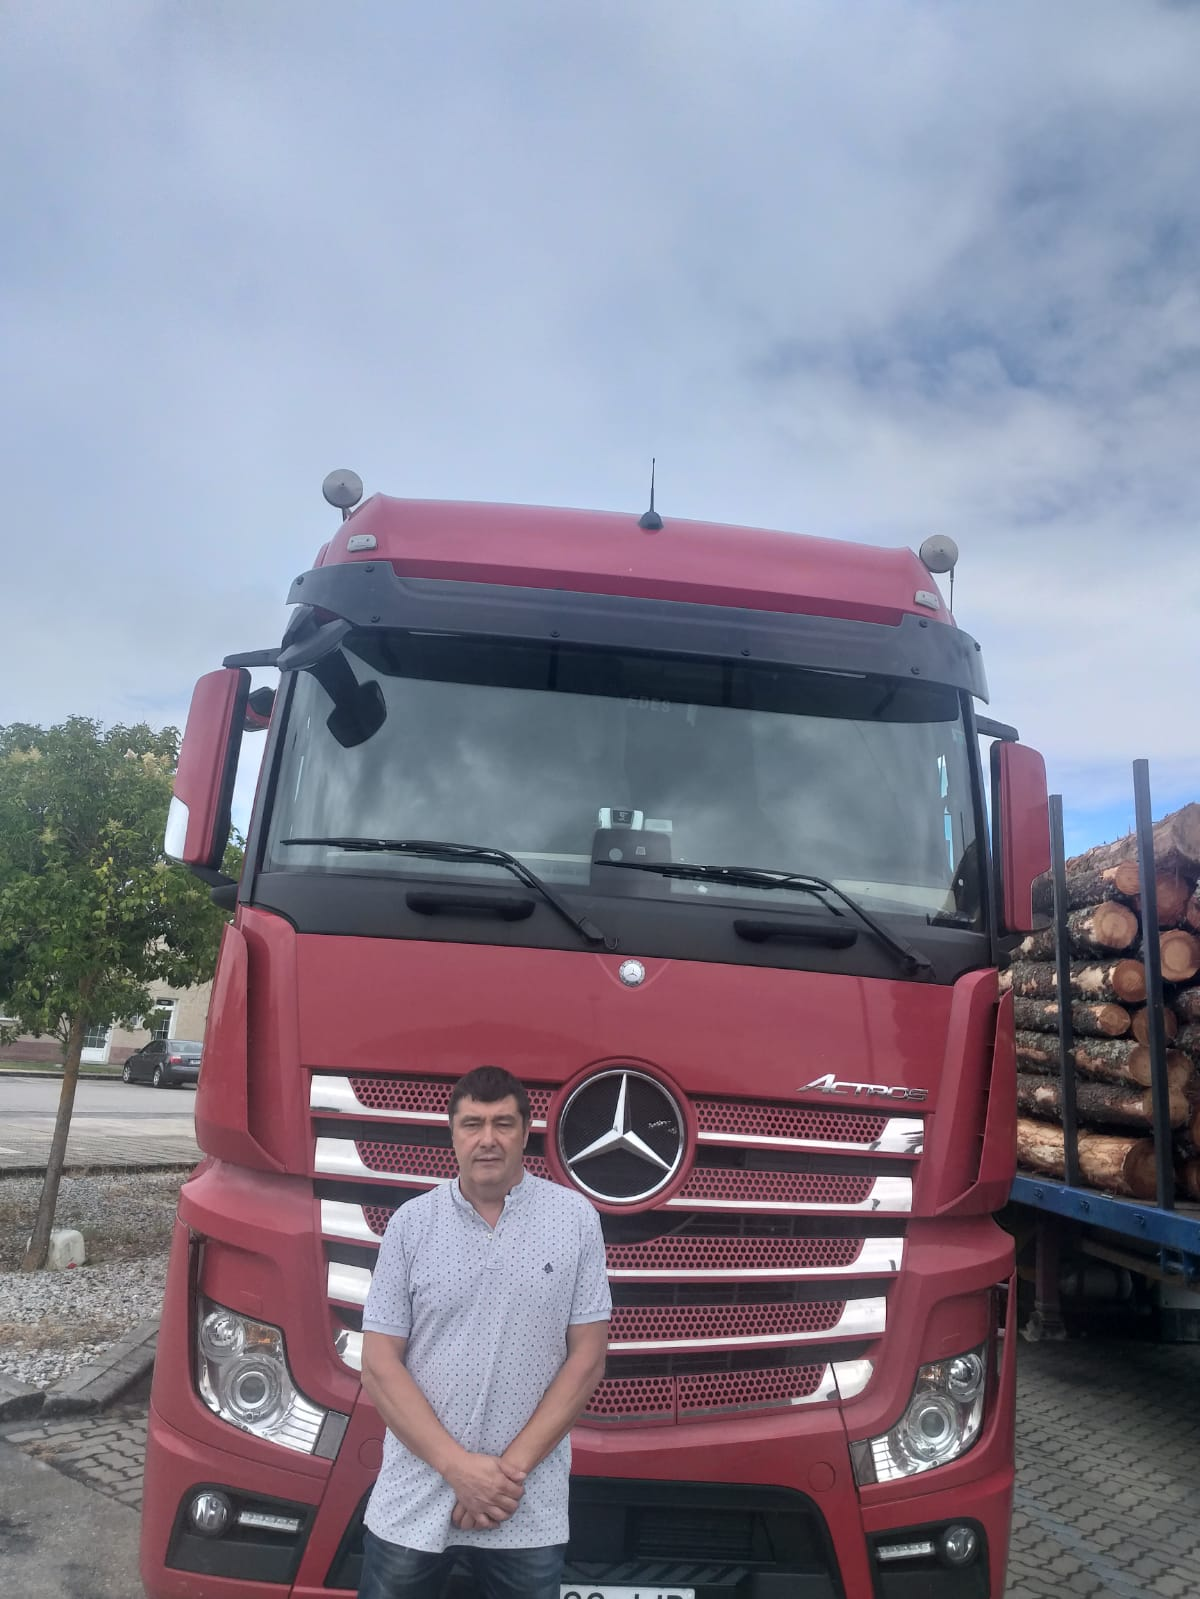 camionero.jpg